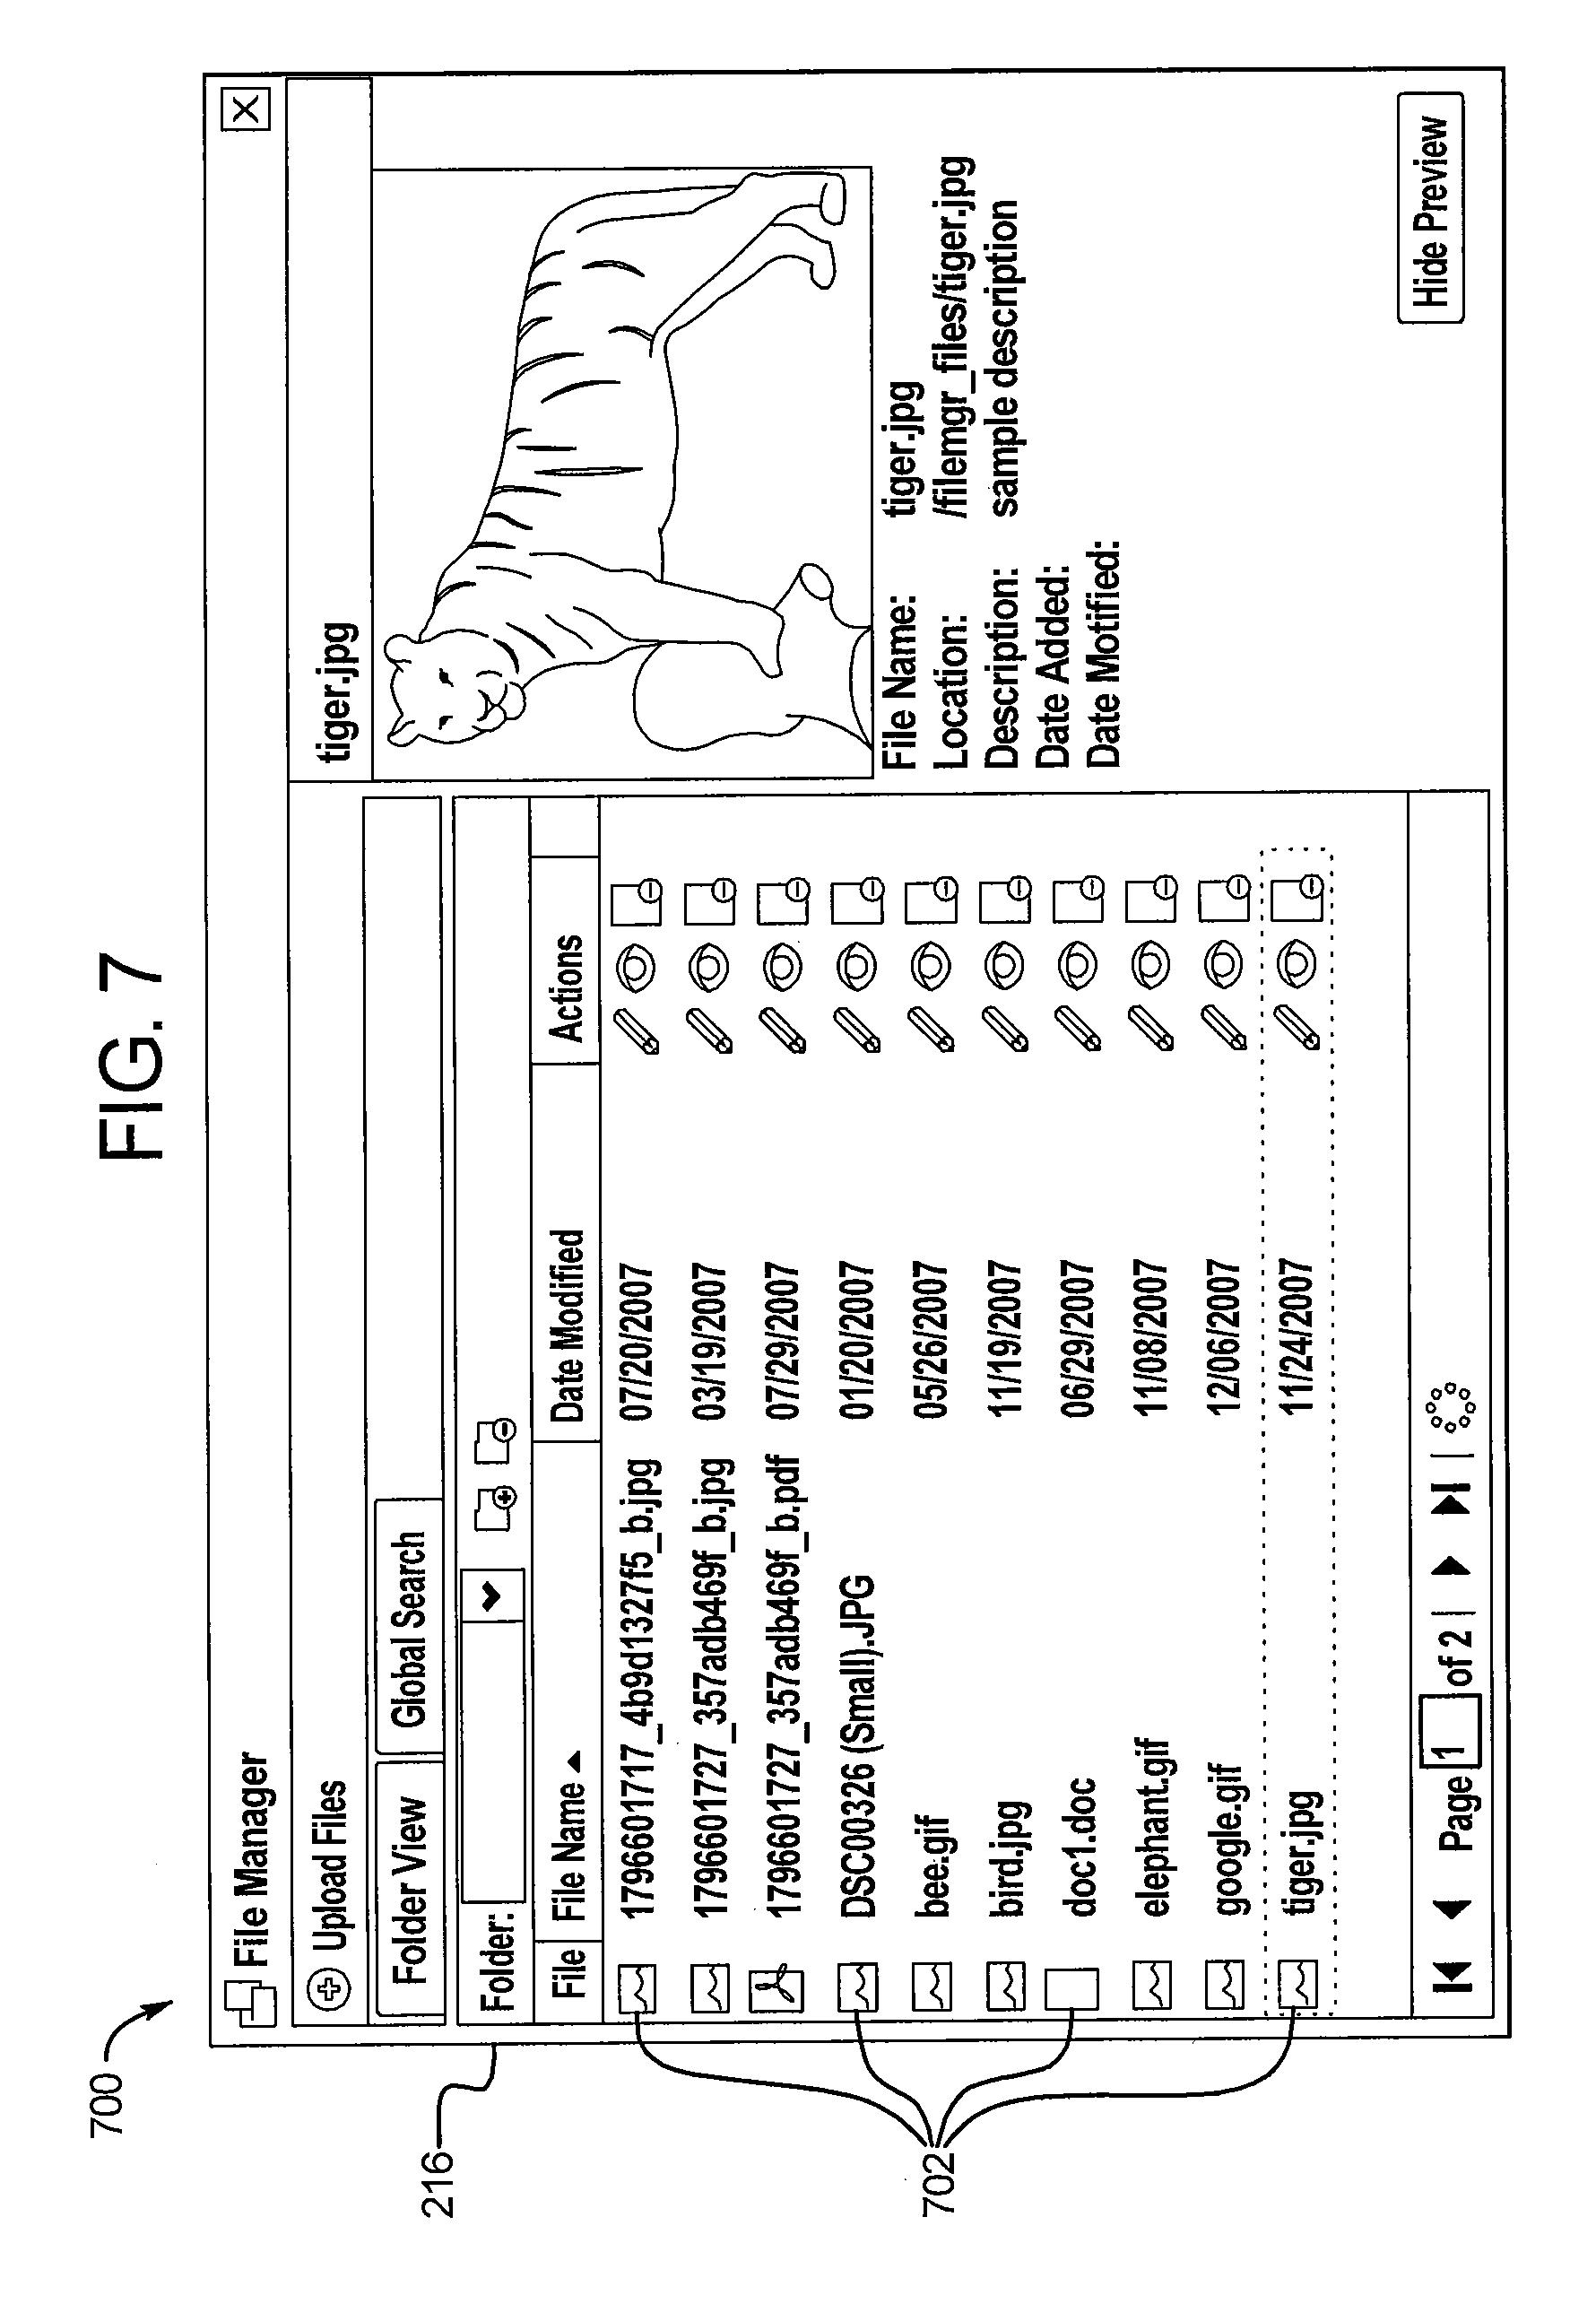 Patent US 8 578 265 B2